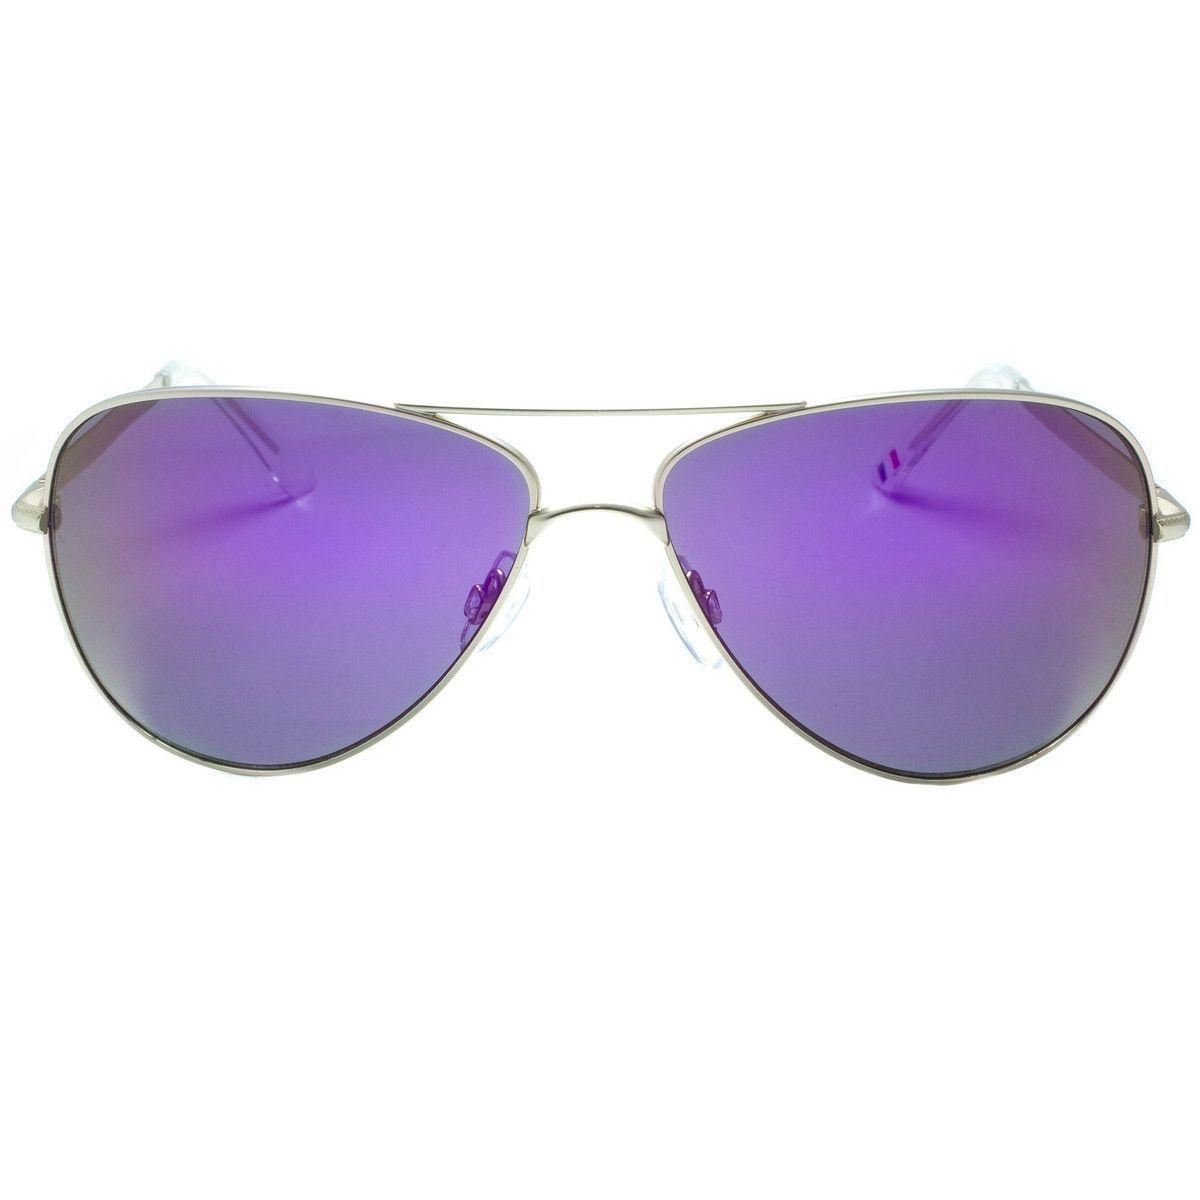 Aviator Style Sunglasses Purple Lenses Gold Temple